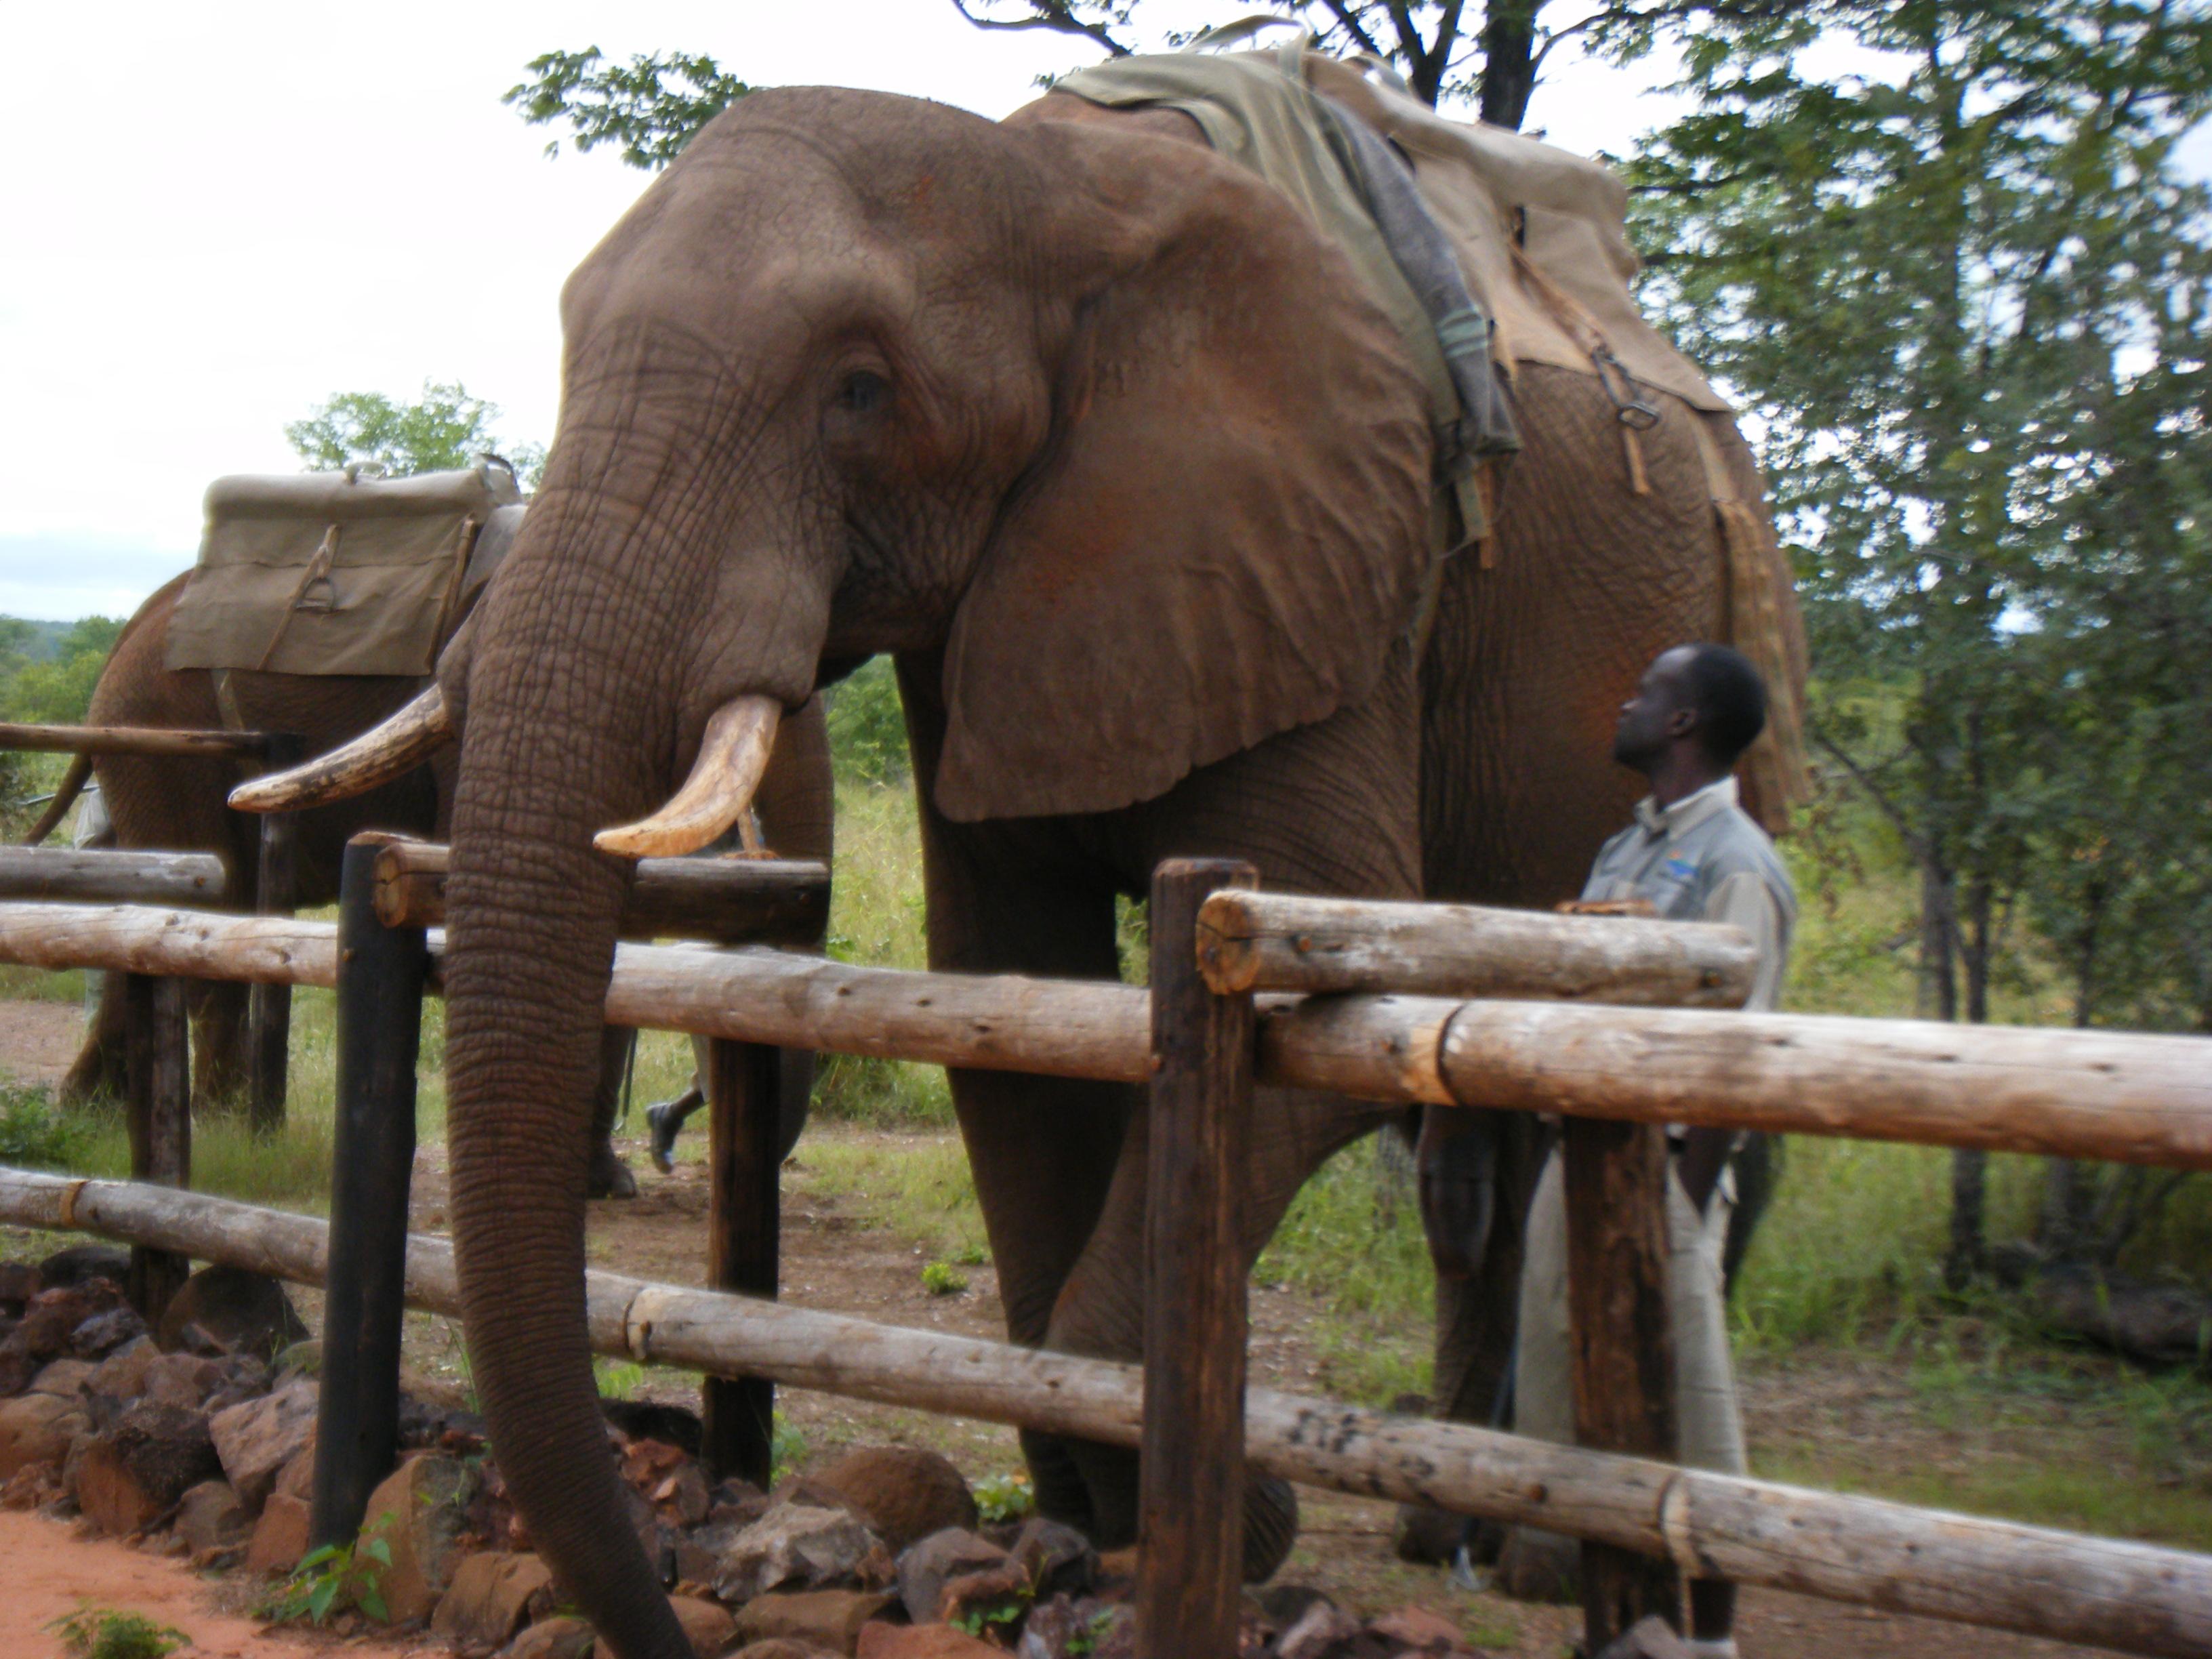 Elephants preparing for the Elephant Back Safari